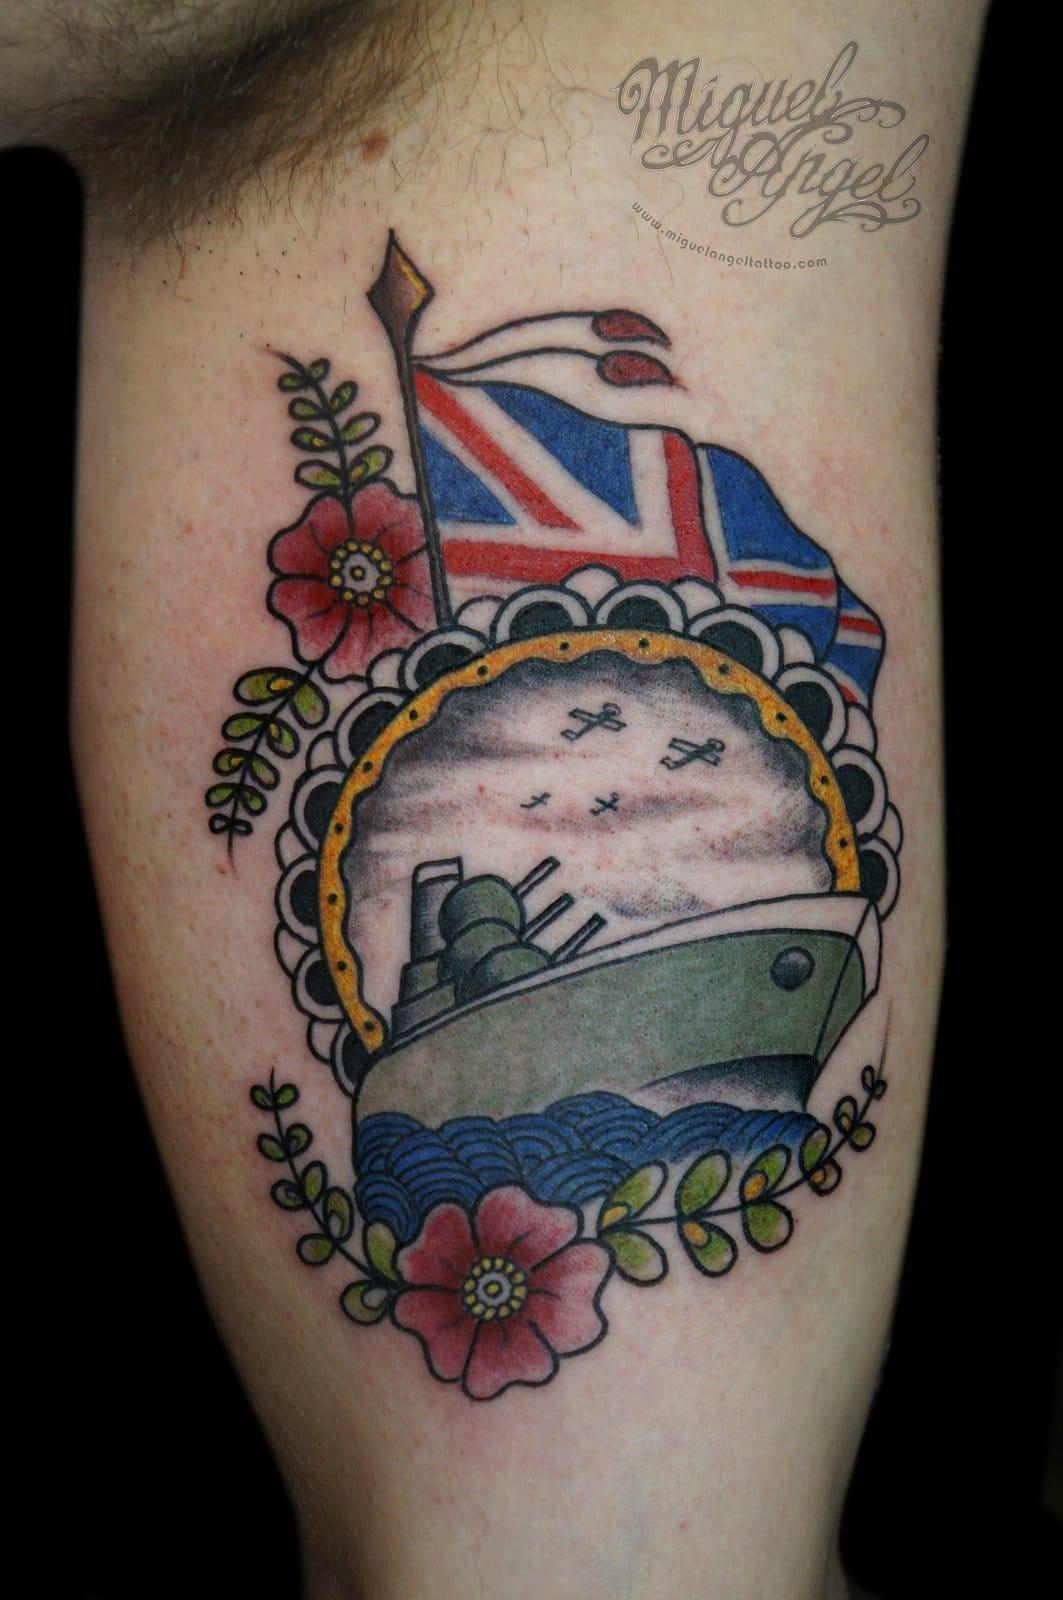 Miguel Angel tattooed this British naval tribute!